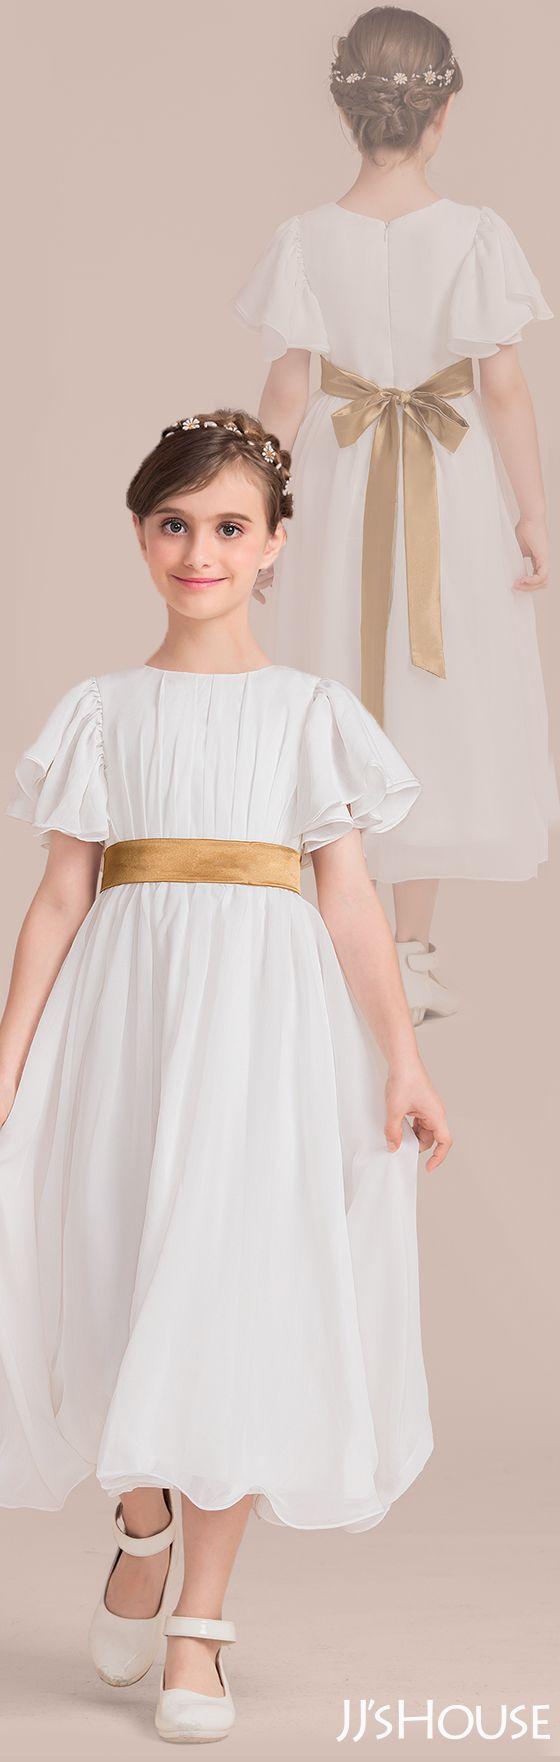 188 best junior bridesmaid dresses images on pinterest the chiffon junior bridesmaid dress is so amazing jjshouse junior bridesmaid ombrellifo Choice Image